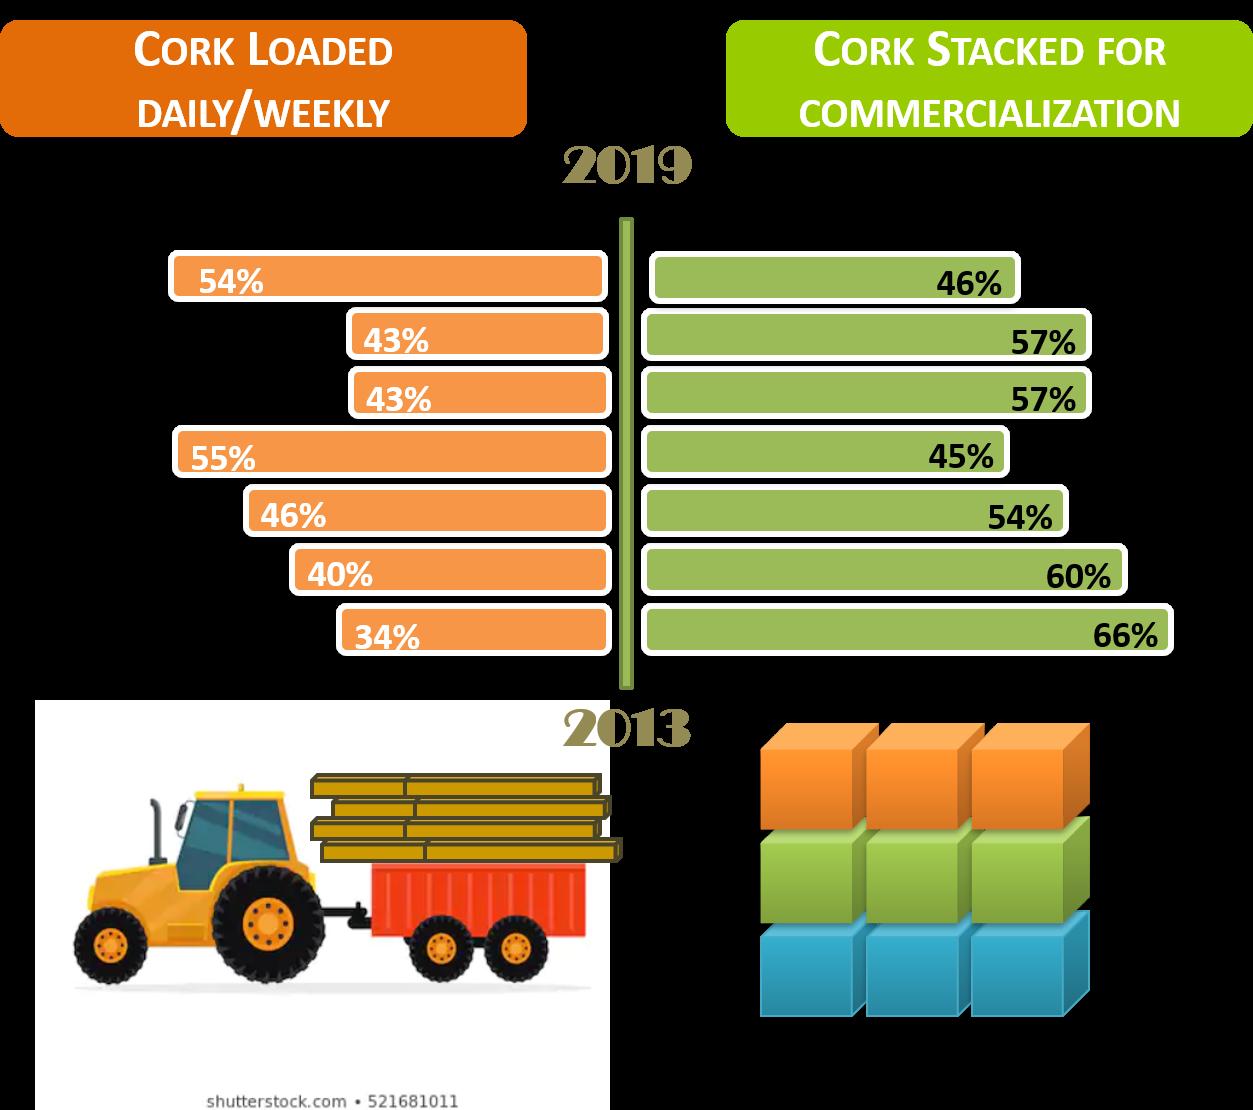 Cork commercialization model